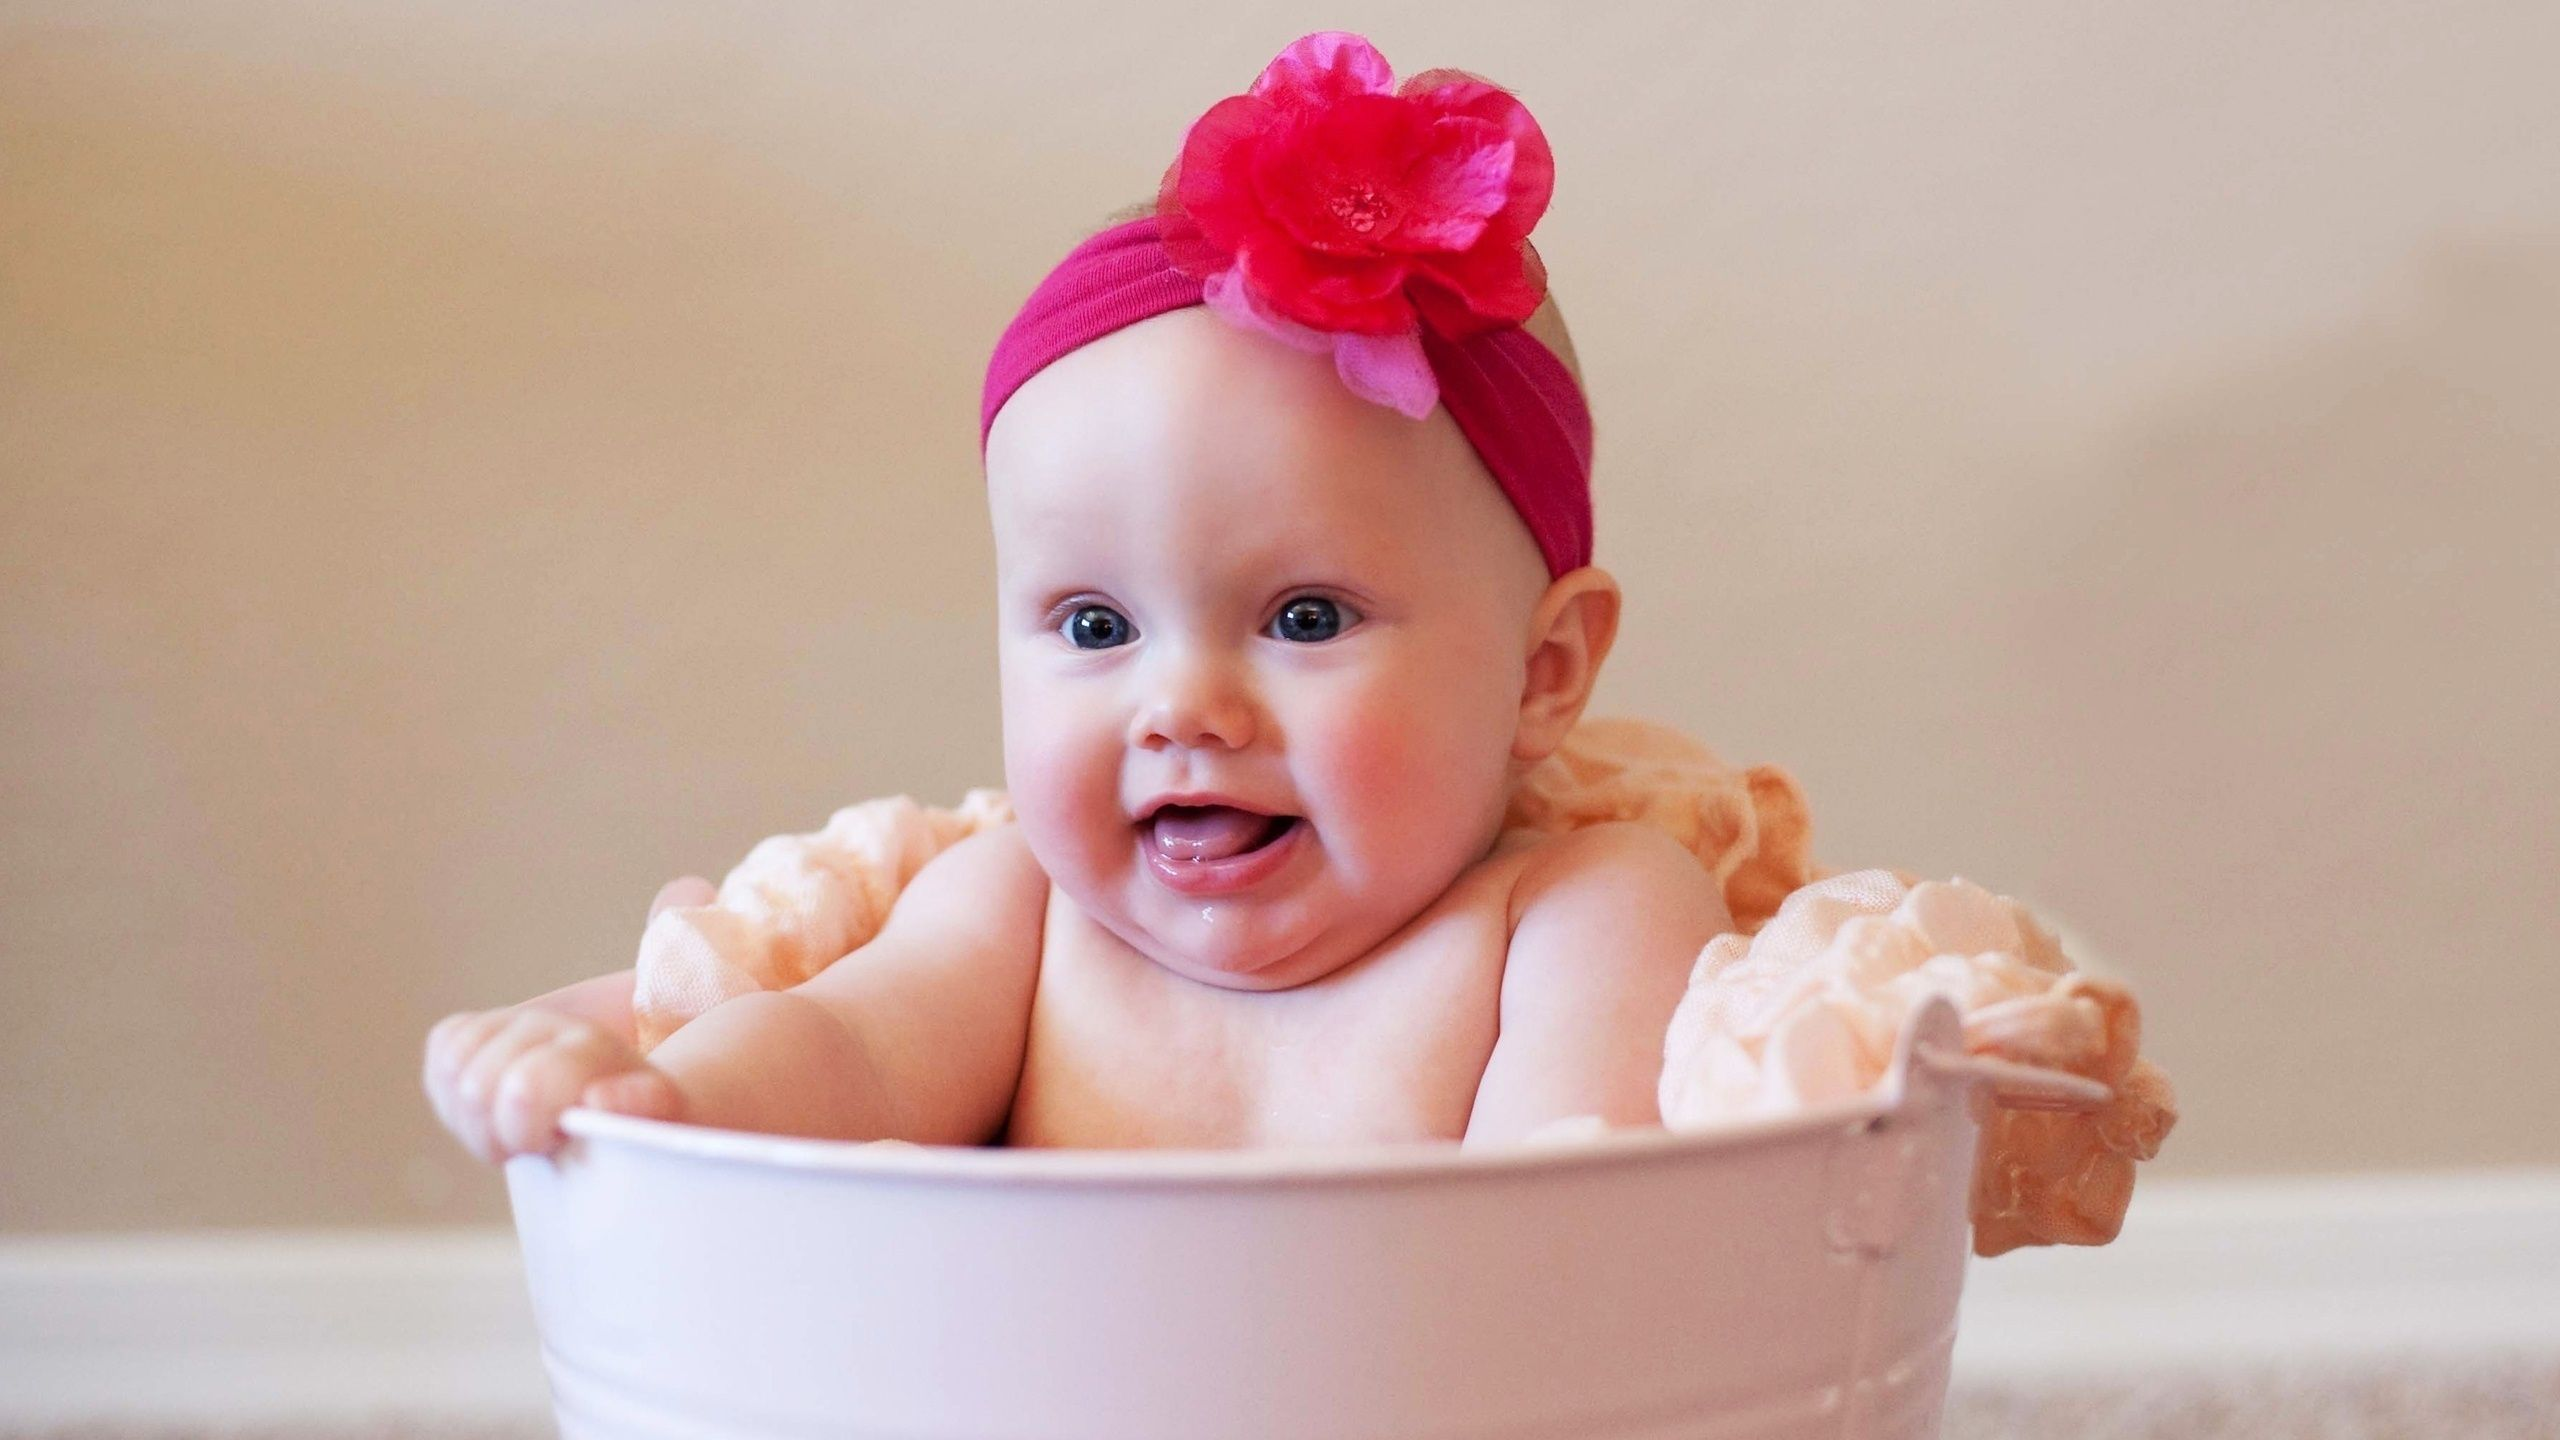 Картинка: Ребёнок, малыш, девочка, повязка, цветок, тазик